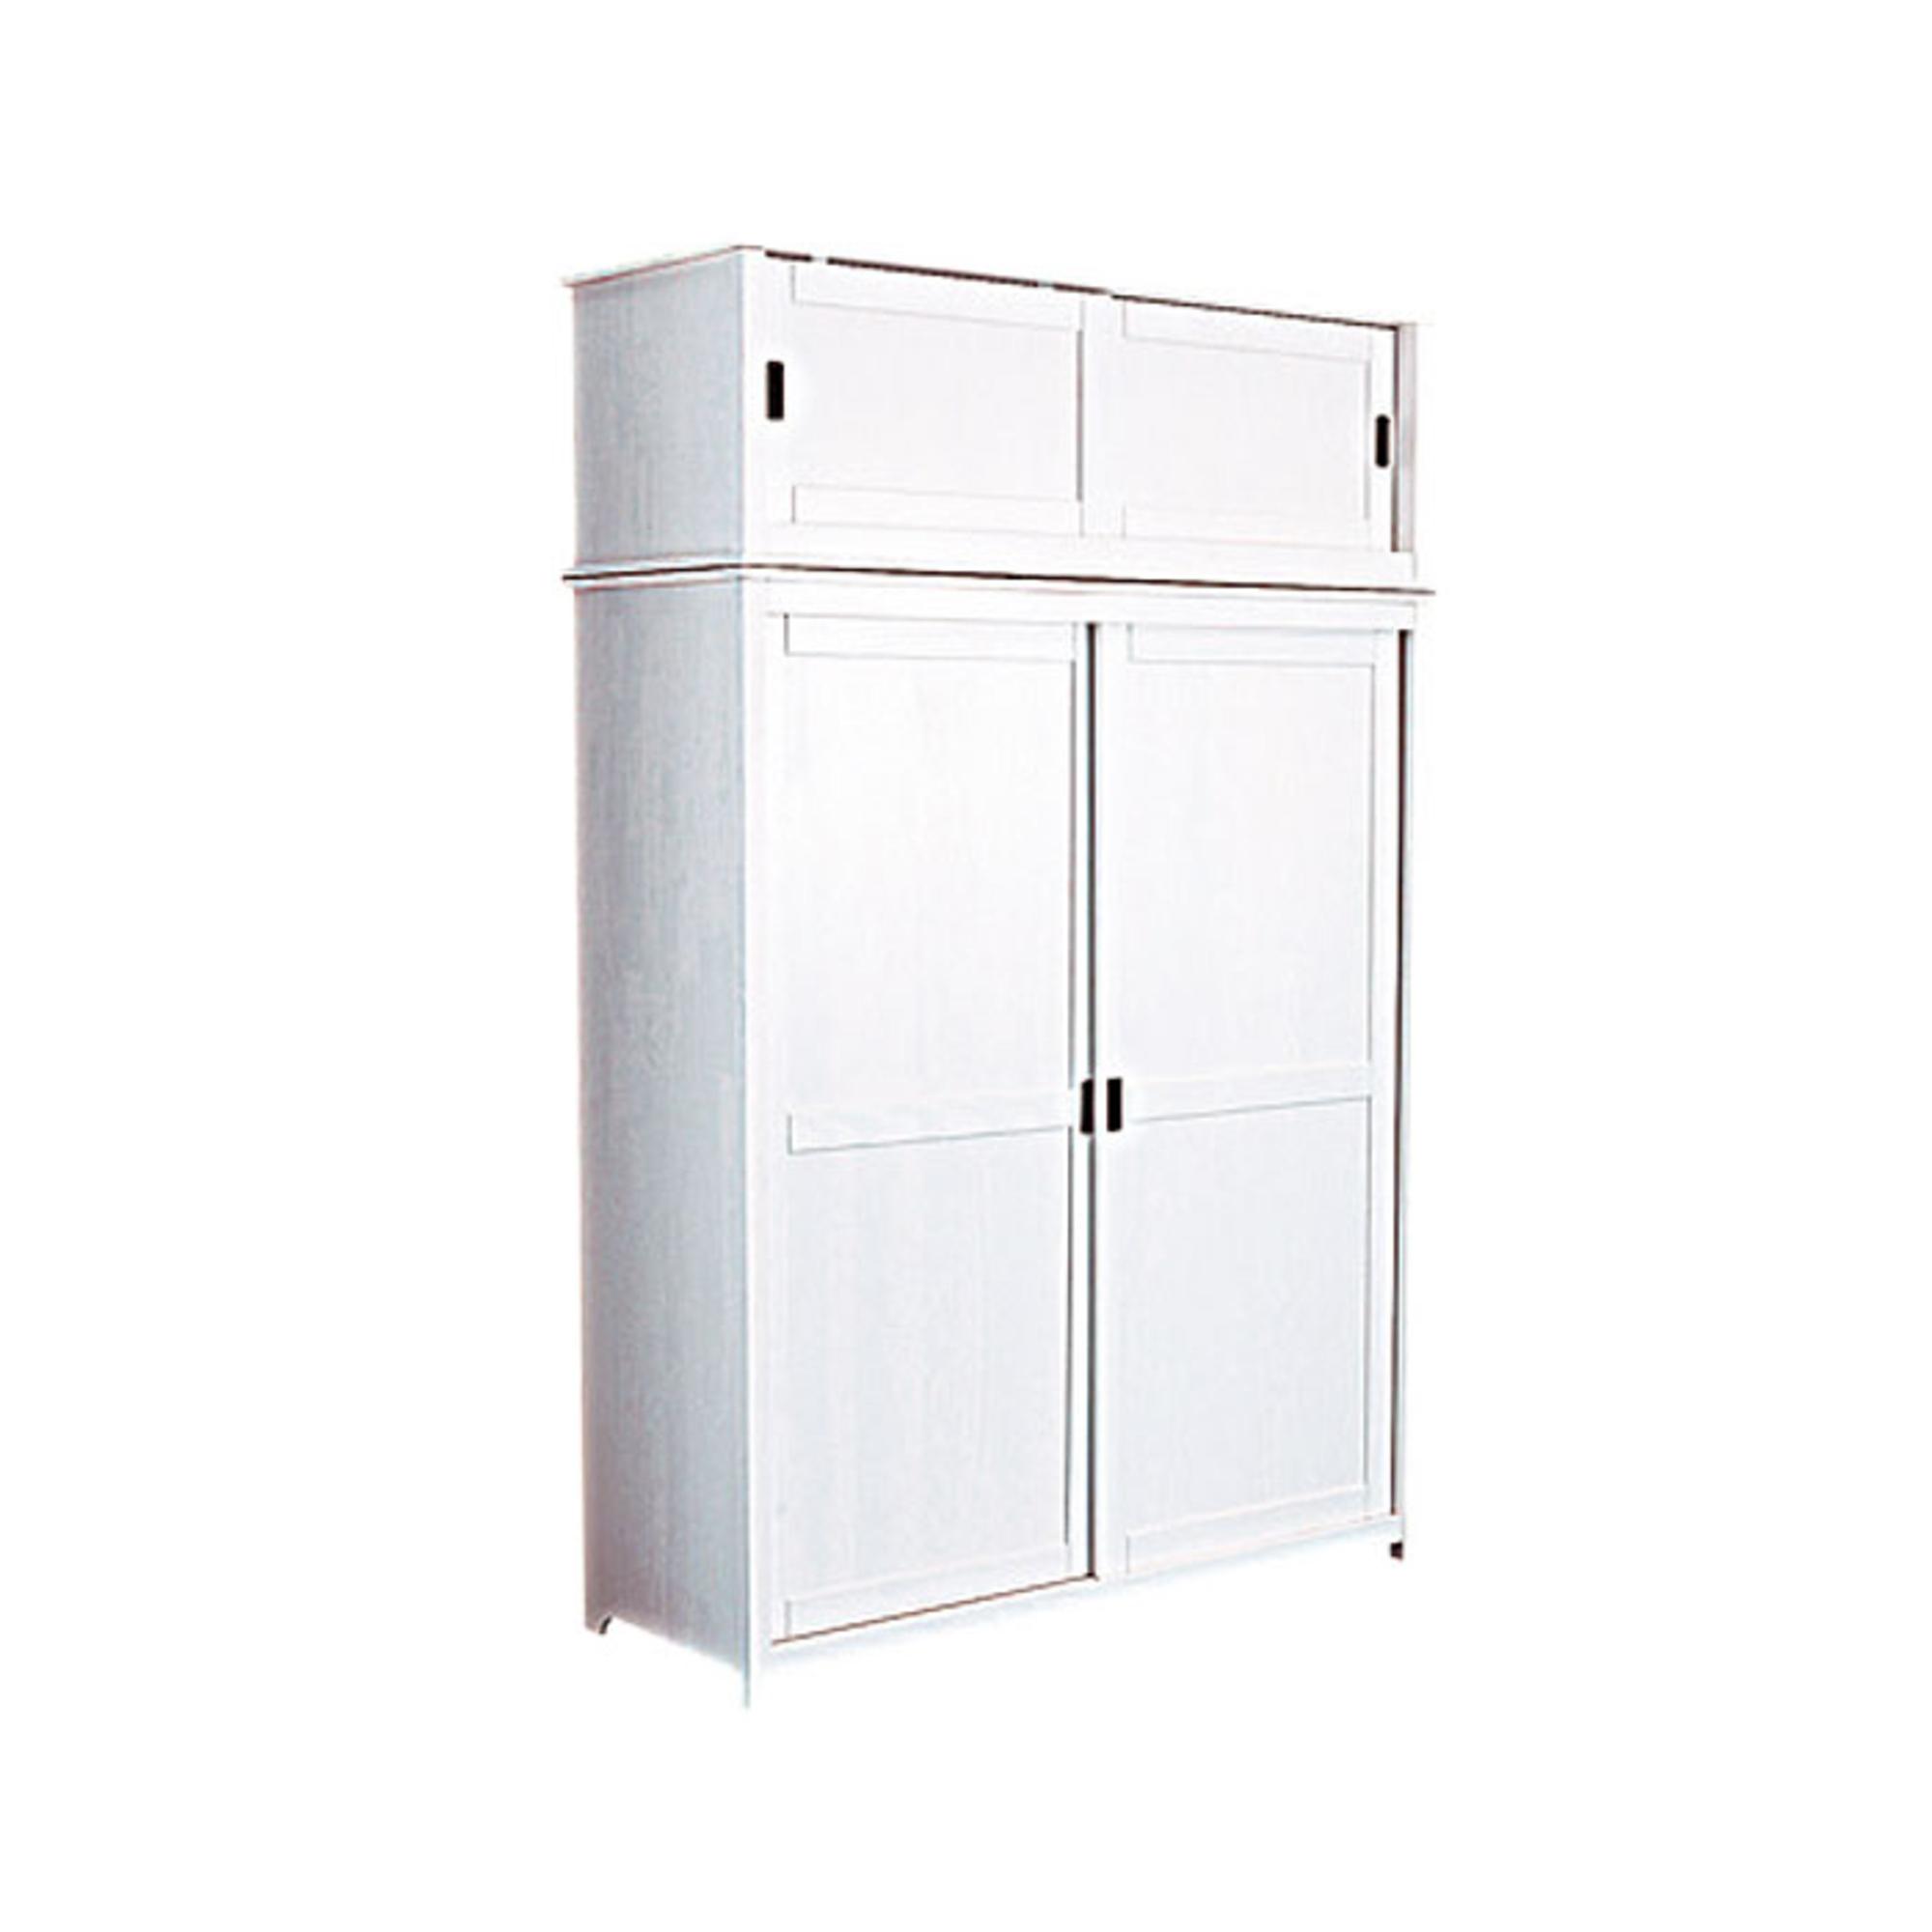 armoire 2 portes surmeuble infinie blanc. Black Bedroom Furniture Sets. Home Design Ideas